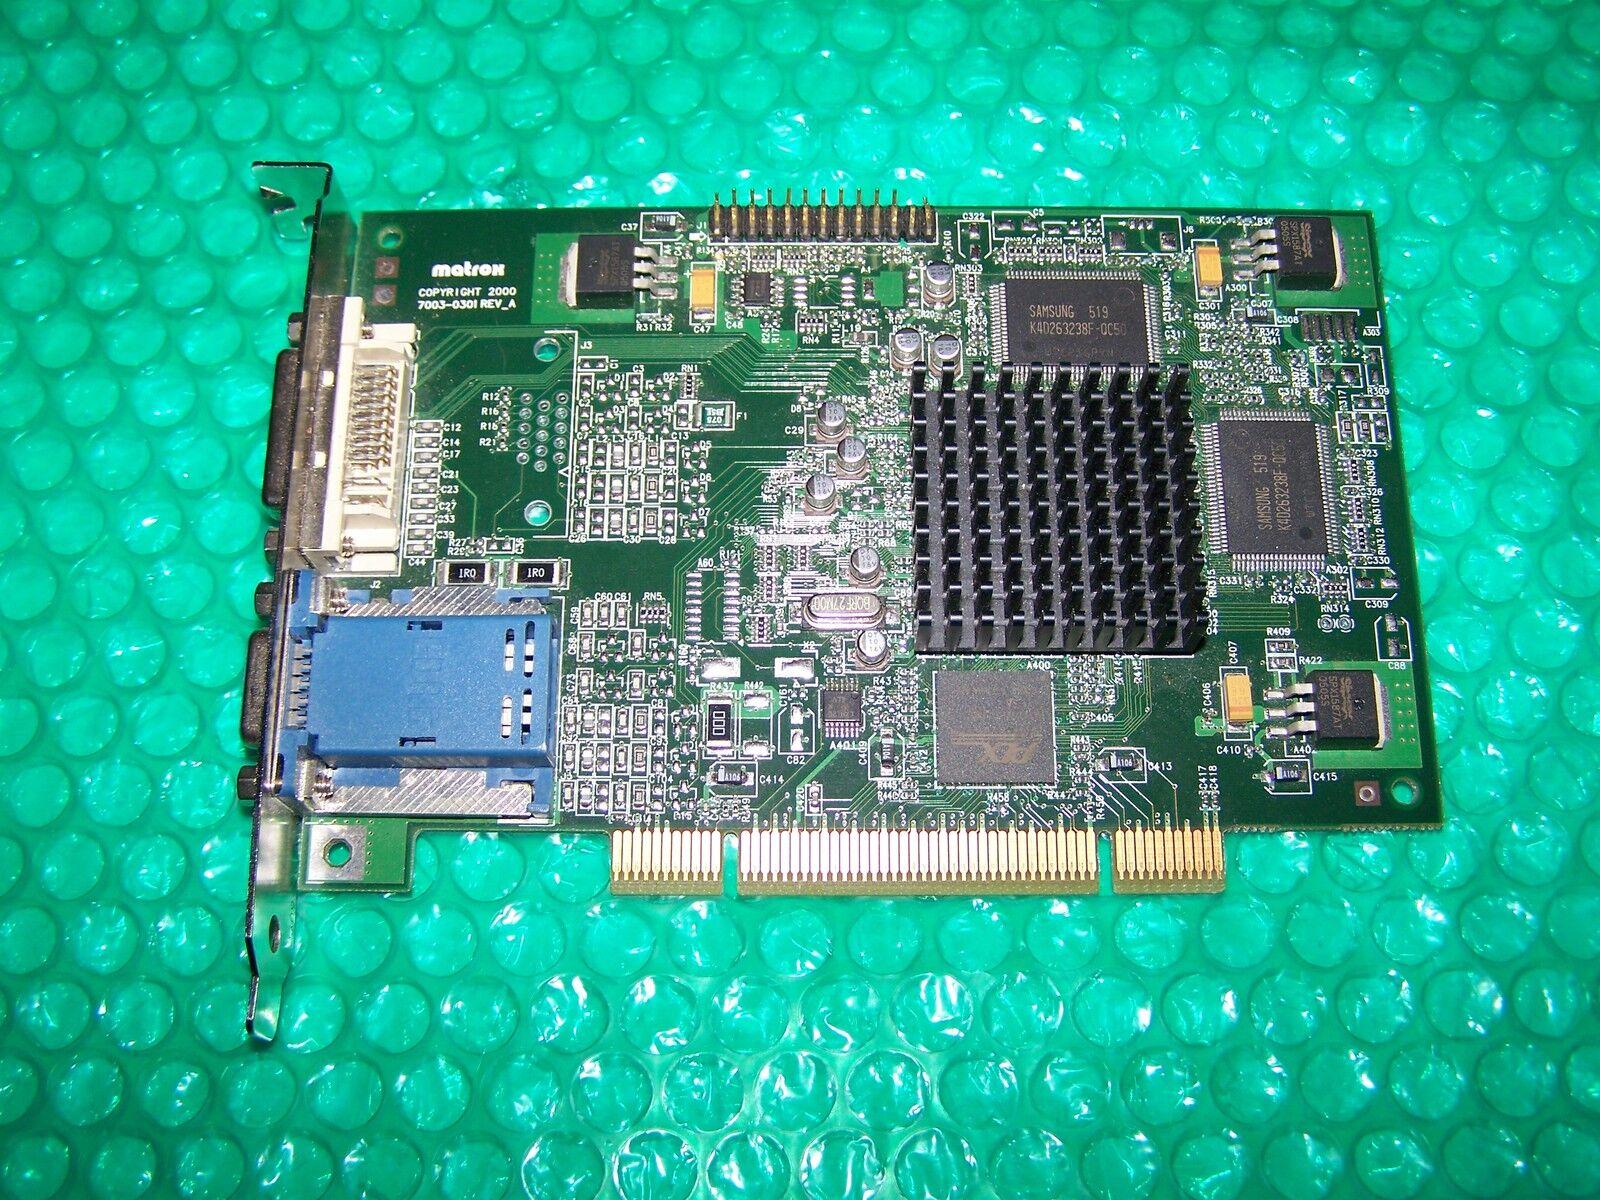 Rare MATROX G450 Dual Display Graphic Card DVI/VGA, standard PCI type (not PCIe)